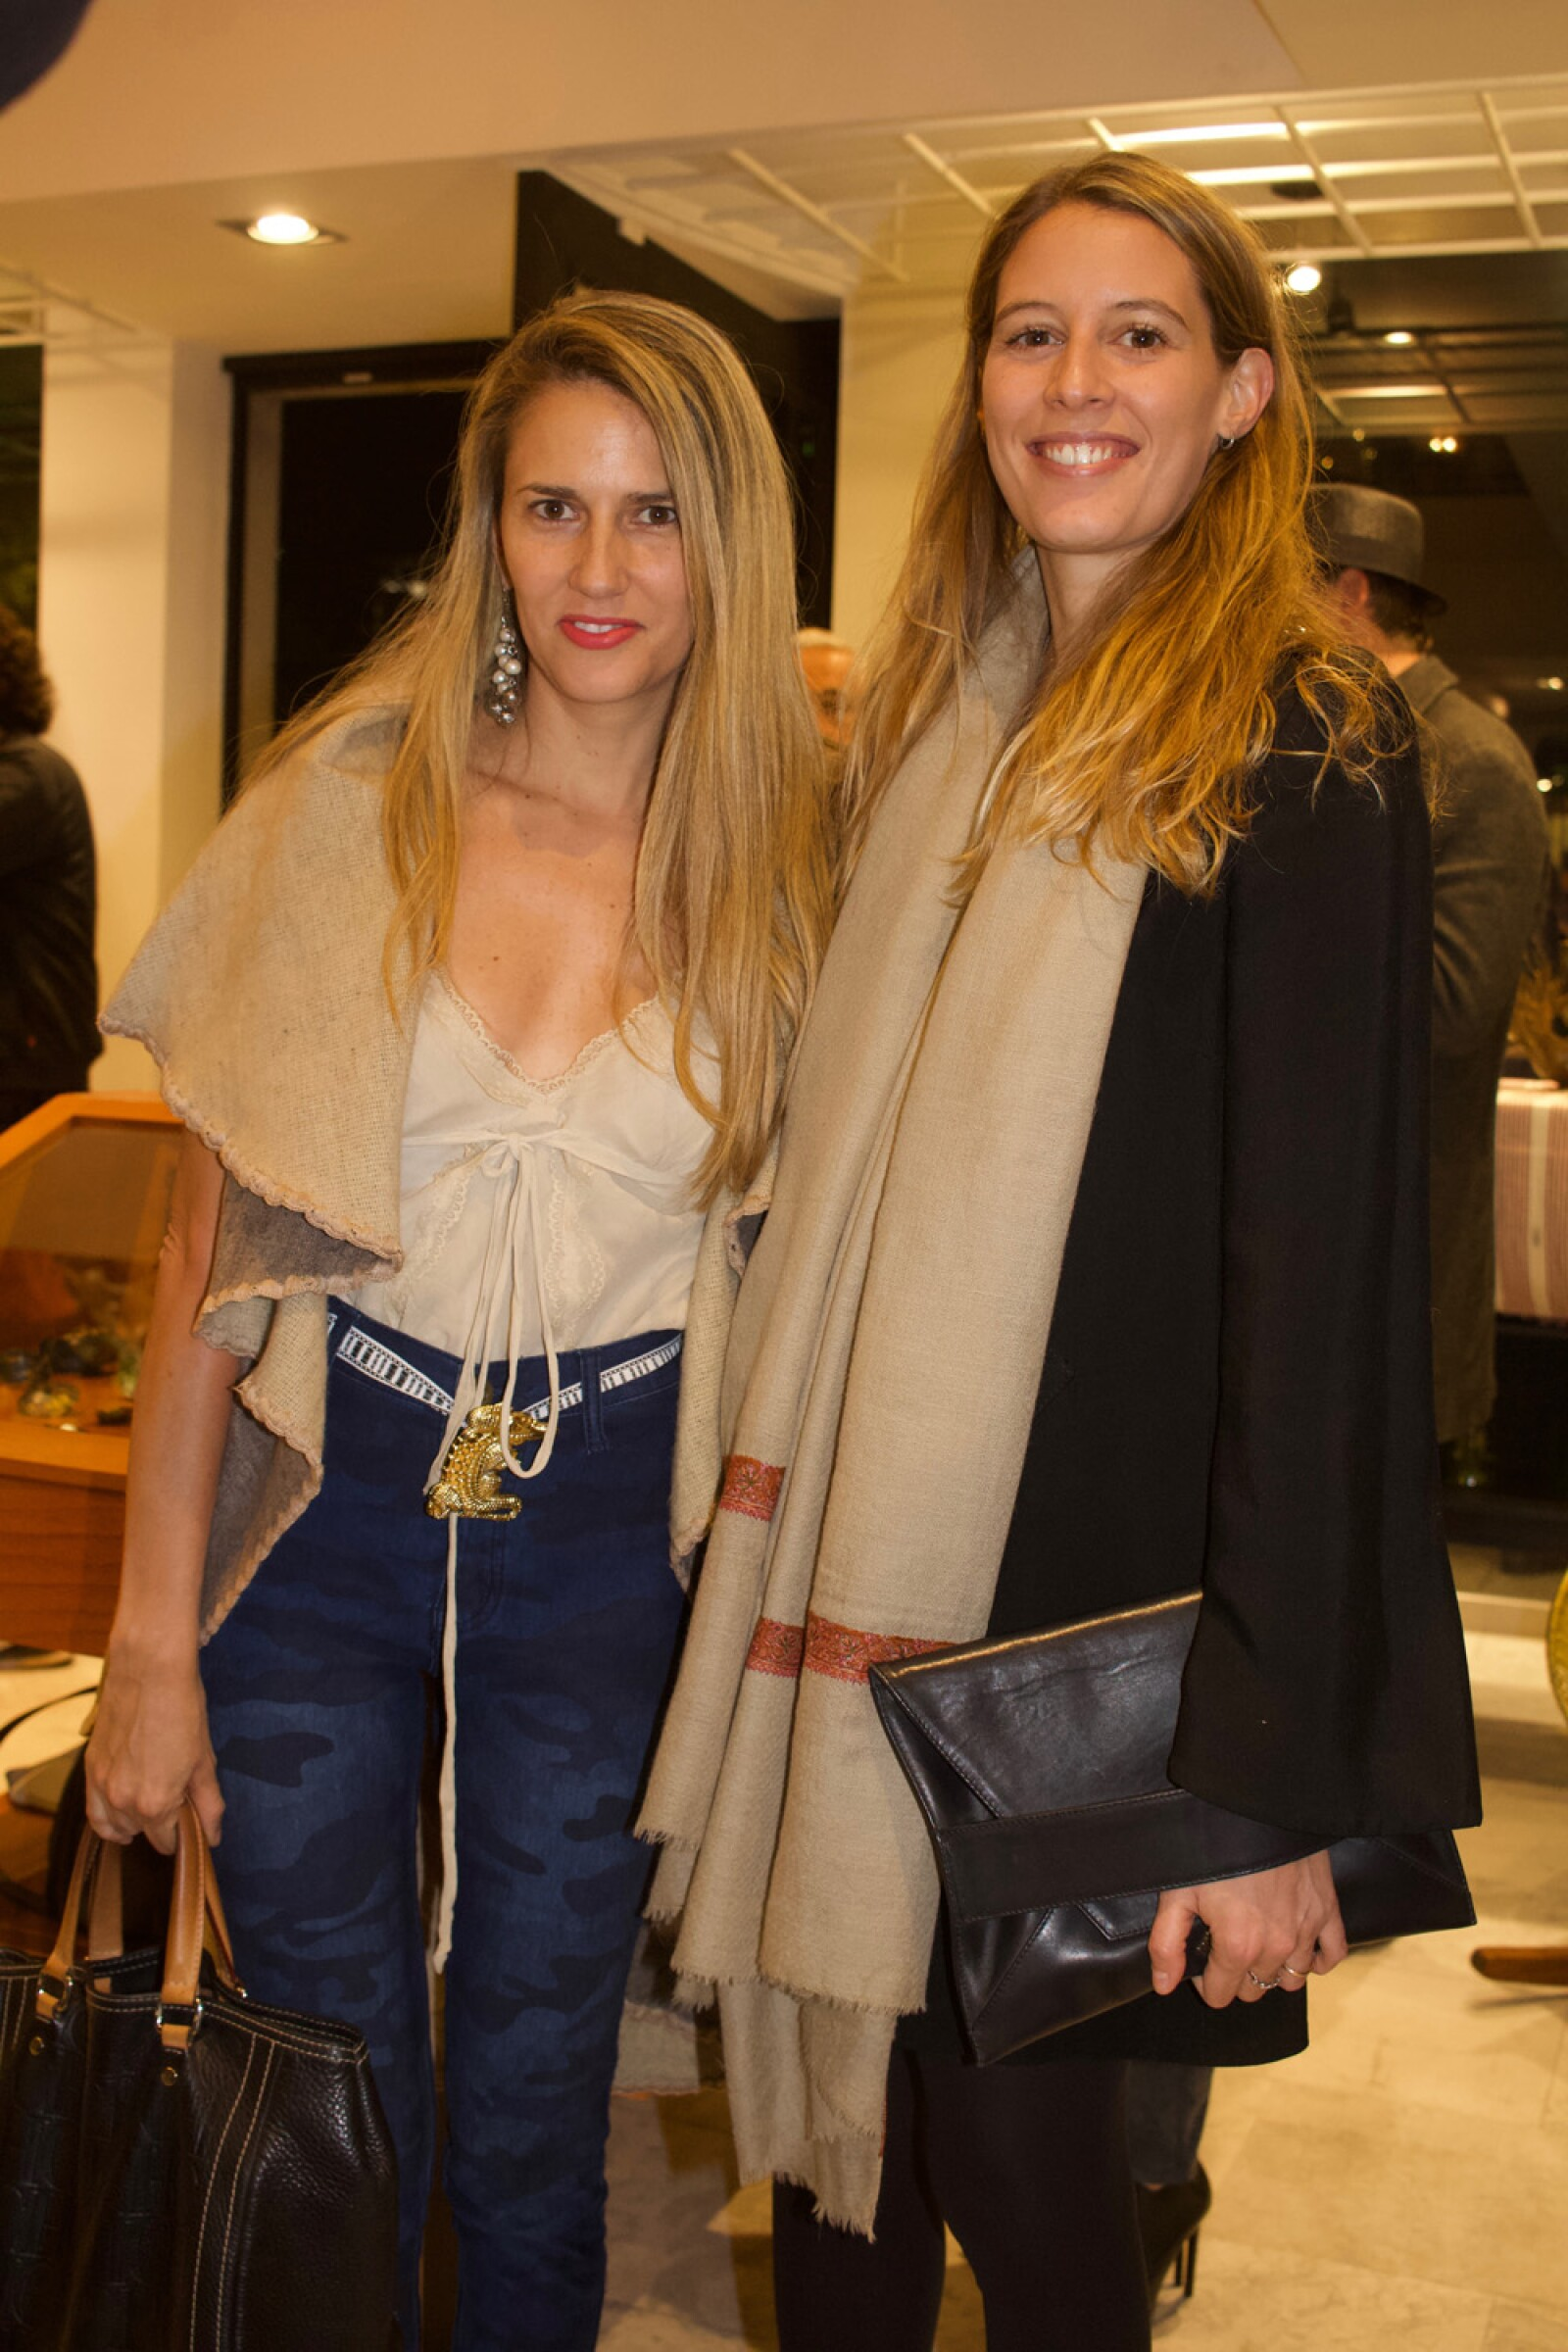 Bebeera Quaratesi y Daniela Quiñones de la maerca Shigra World.jpg